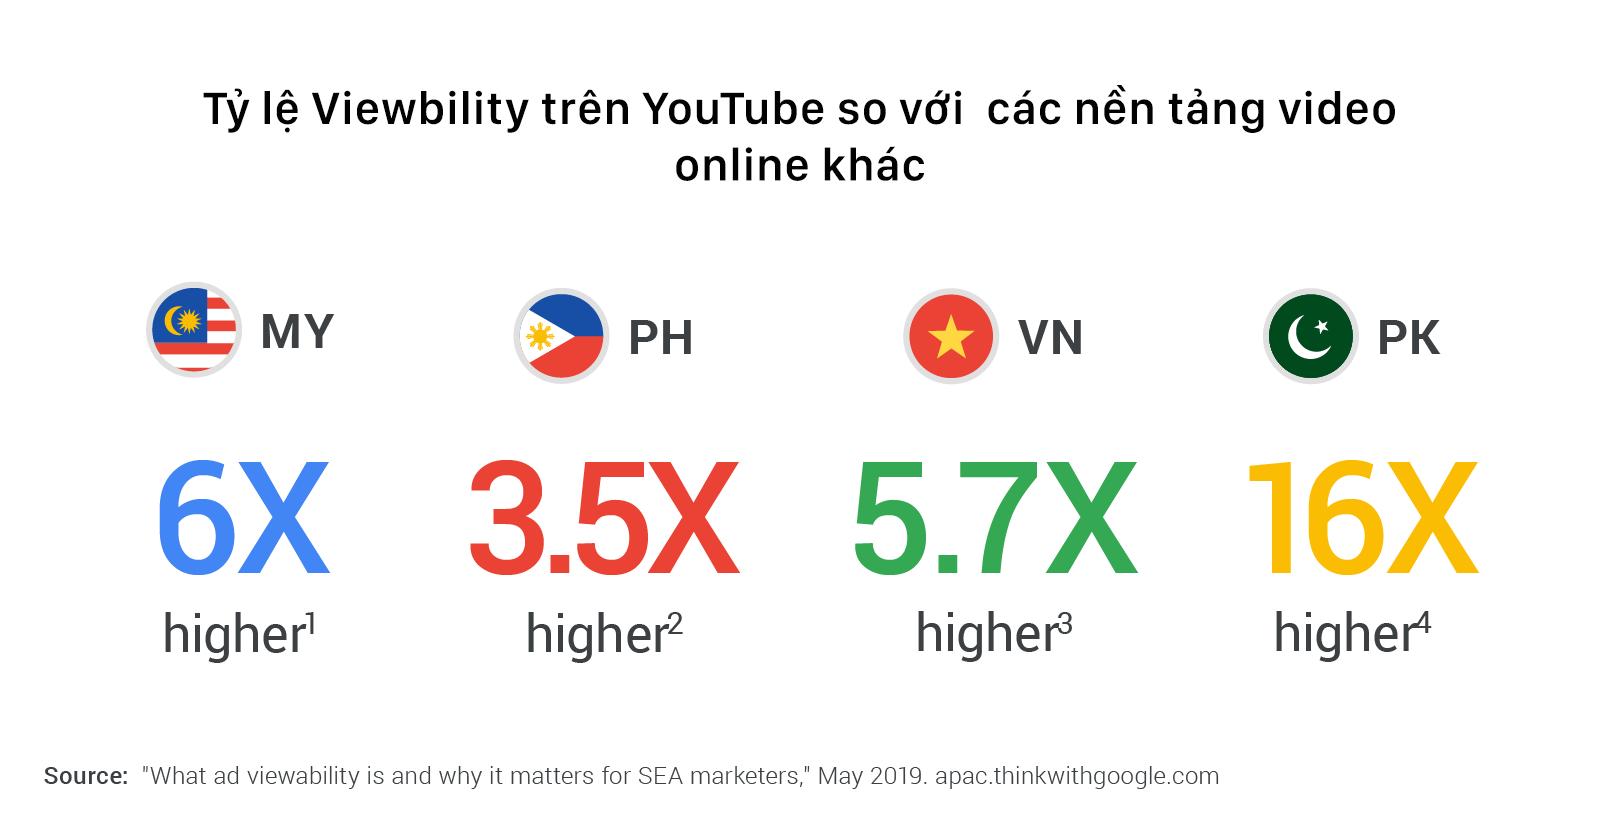 tỷ lệ viewability